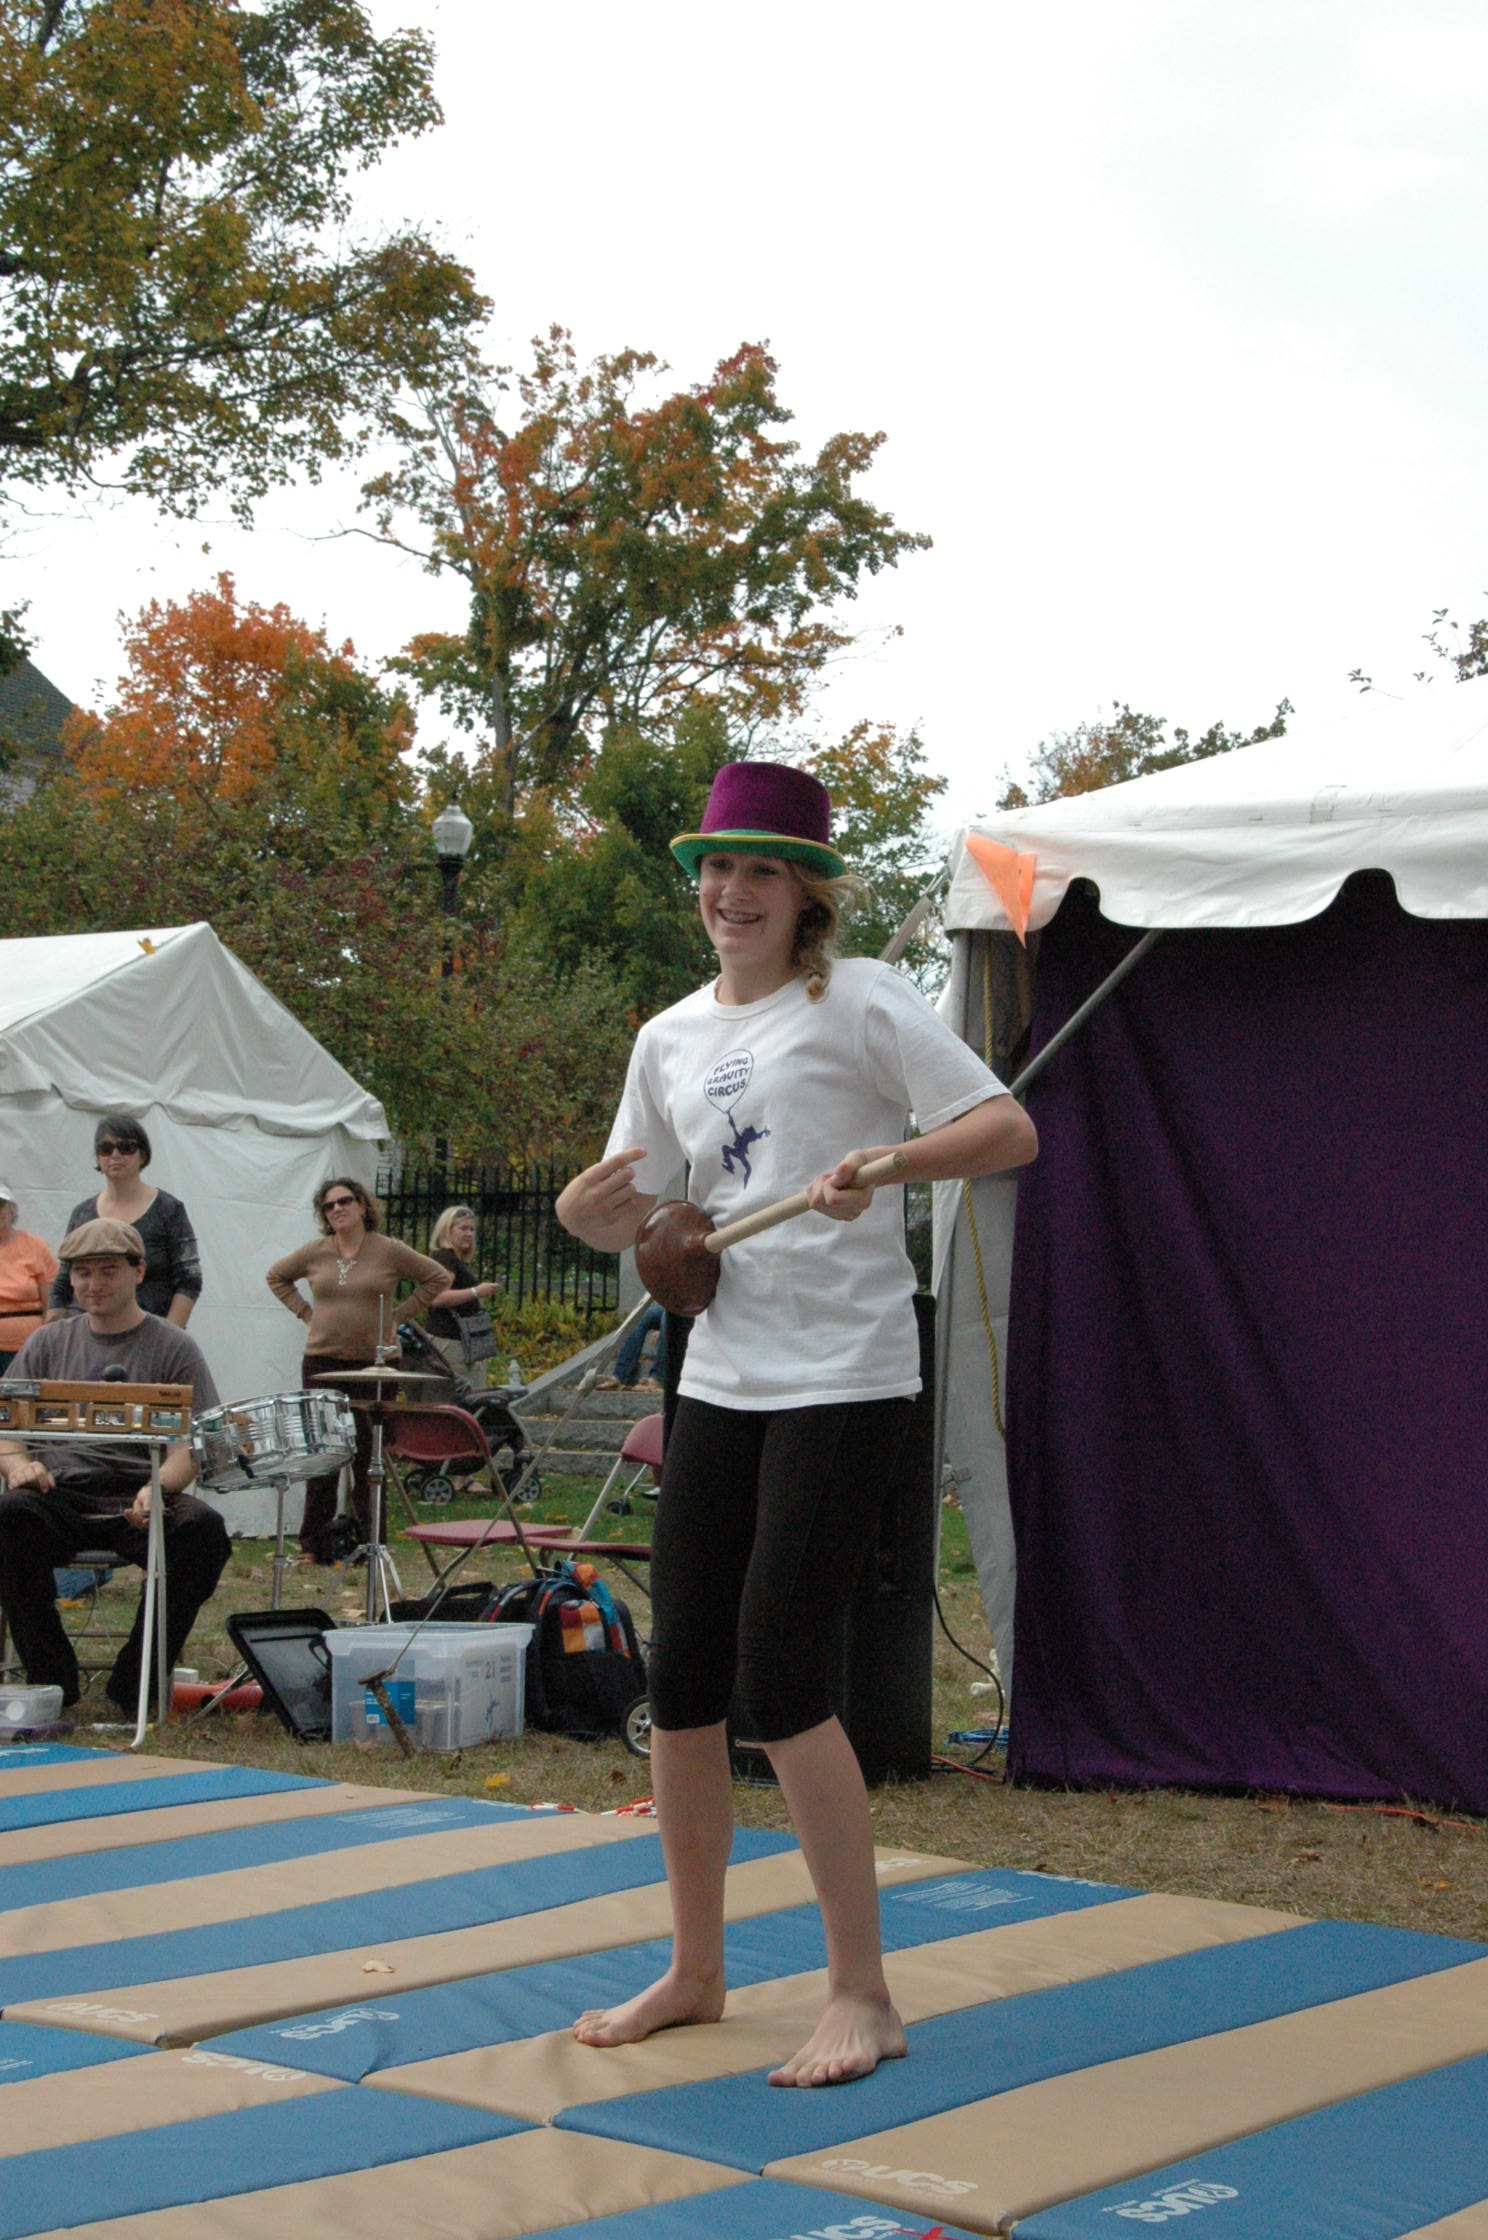 2012-10-06 Flyin Gravity Circus - Pumpkin 111.JPG